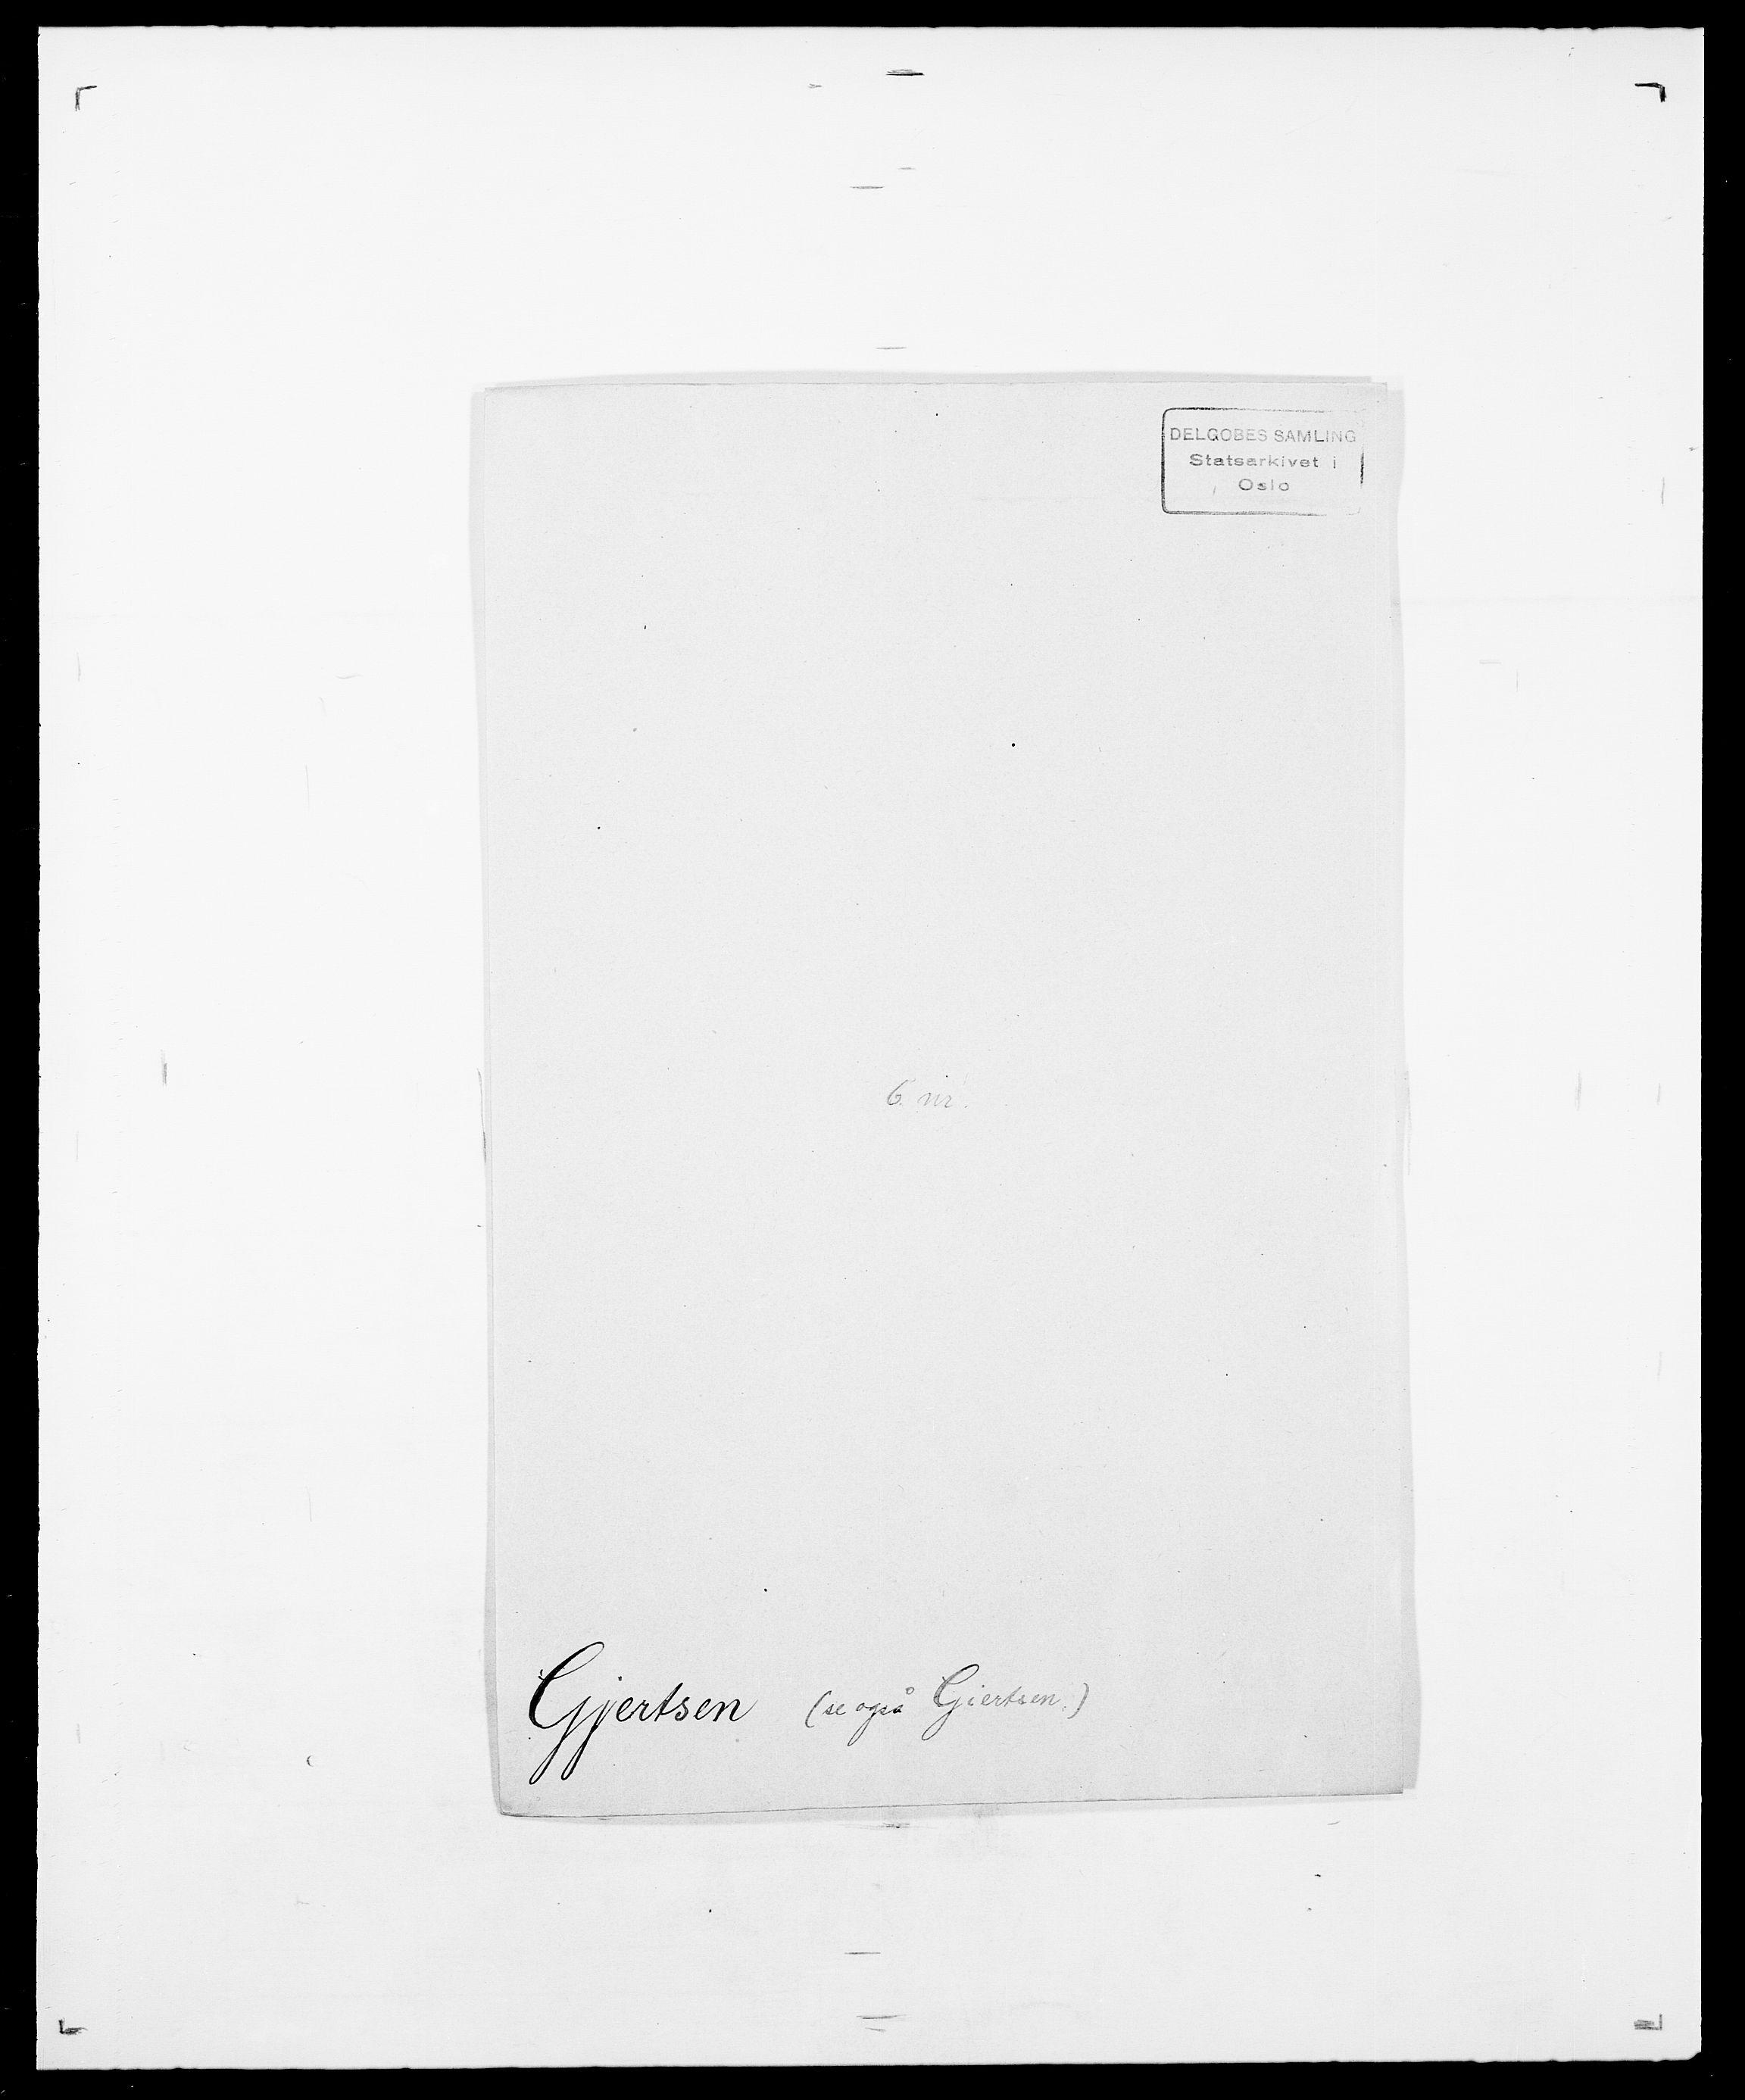 SAO, Delgobe, Charles Antoine - samling, D/Da/L0014: Giebdhausen - Grip, s. 165